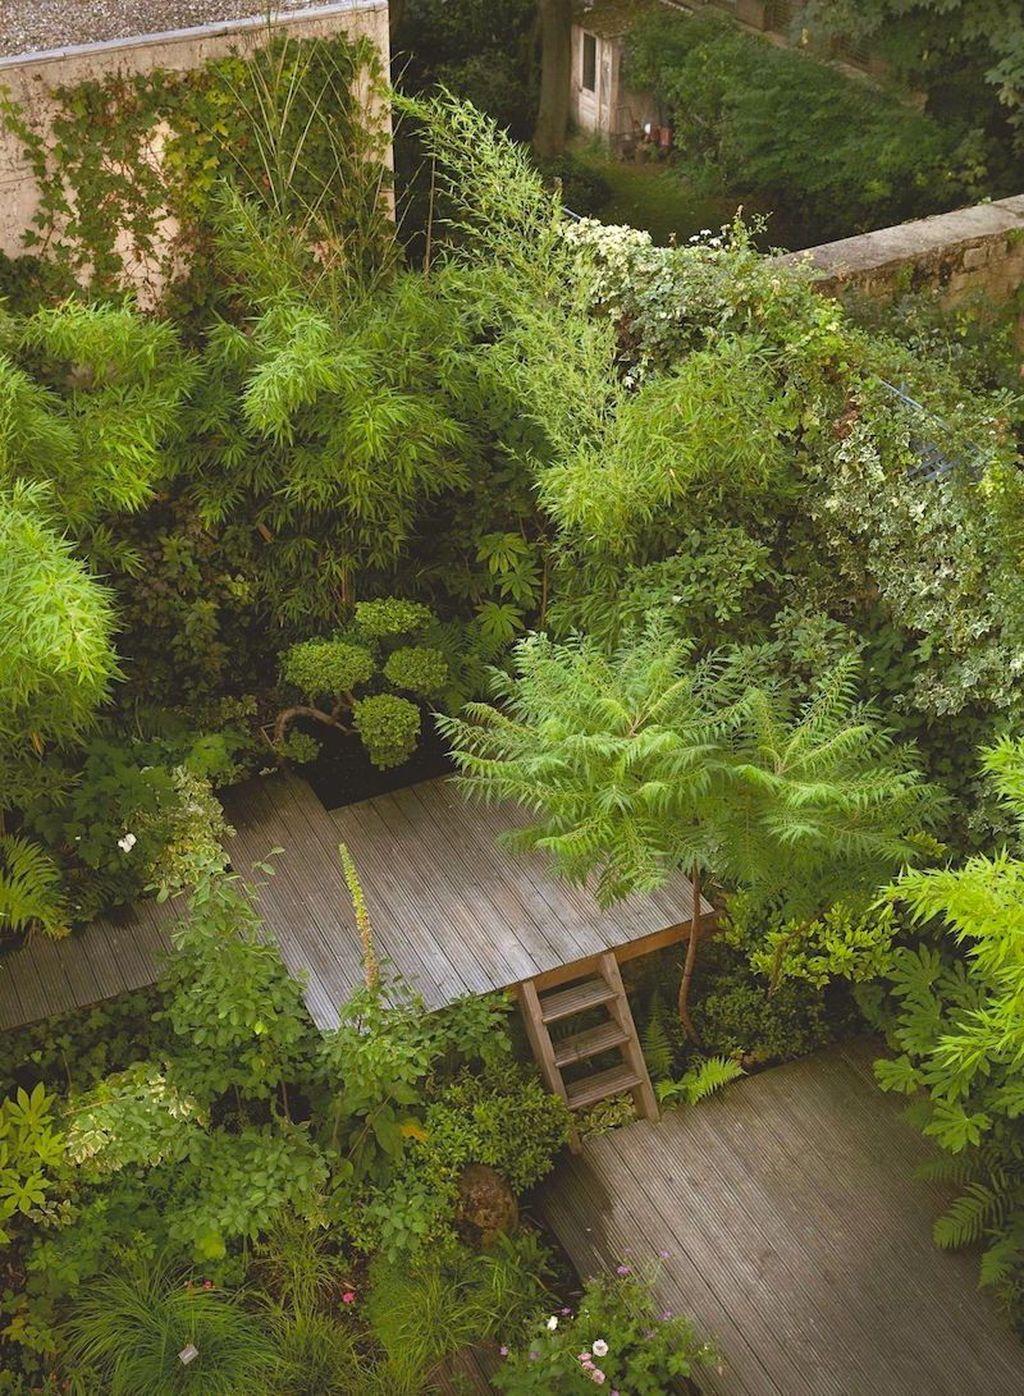 The Best Urban Garden Design Ideas For Your Backyard 11